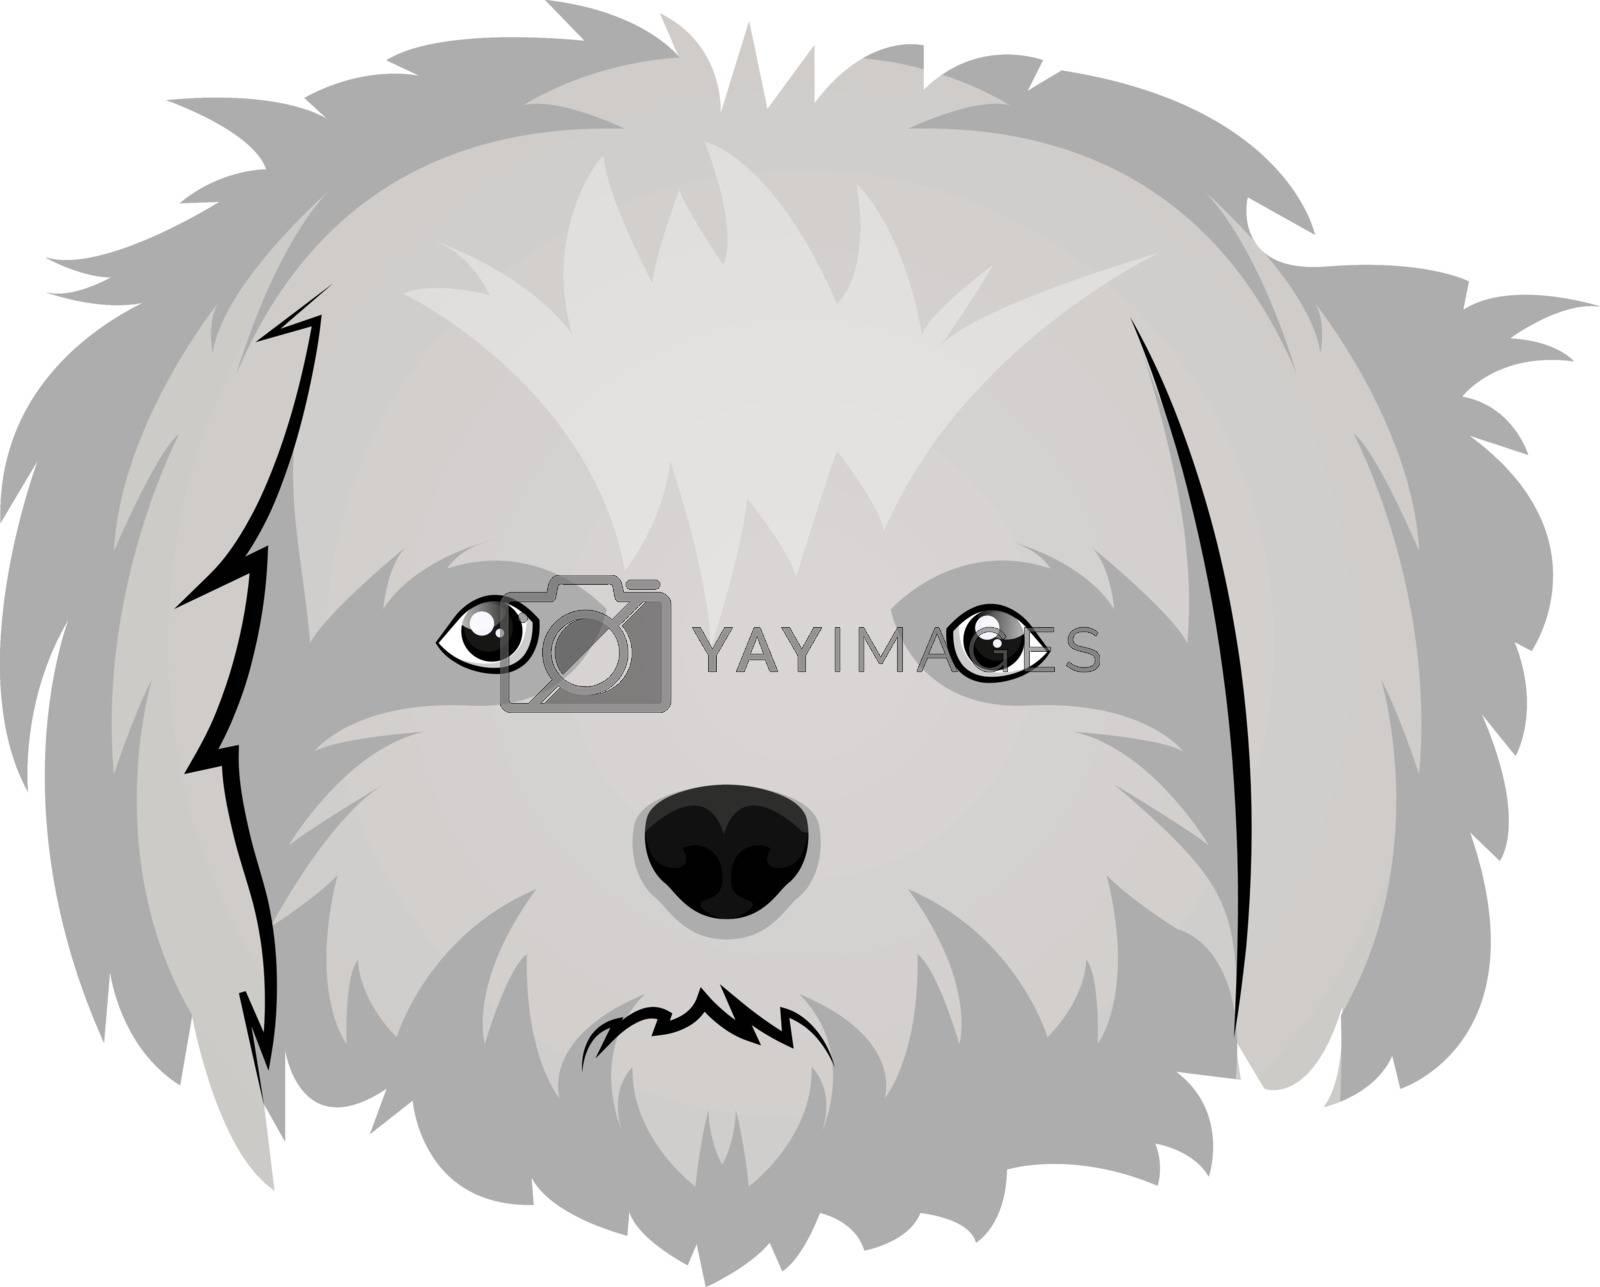 Royalty free image of Maltese illustration vector on white background by Morphart